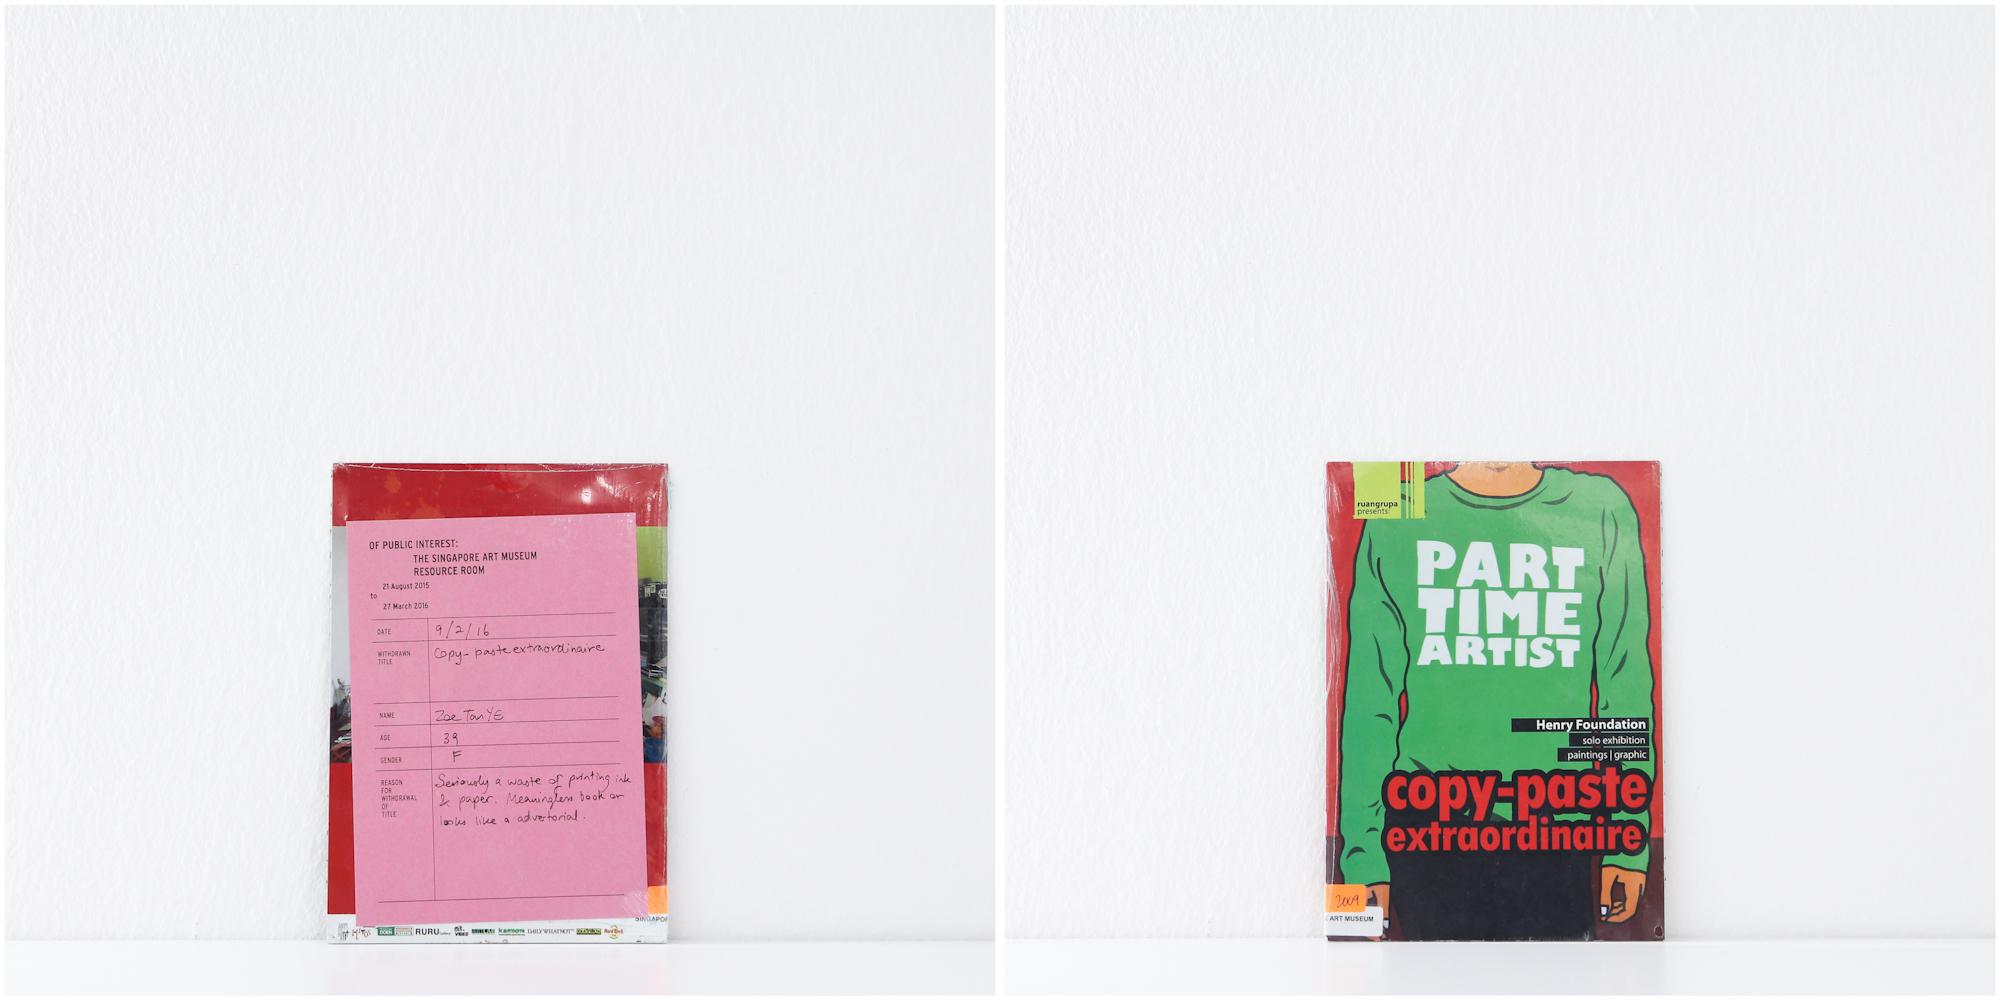 'Part Time Artist, Copy-Paste Extraordinaire', 9/2/16, Zoe Tan Ye, 39, Female